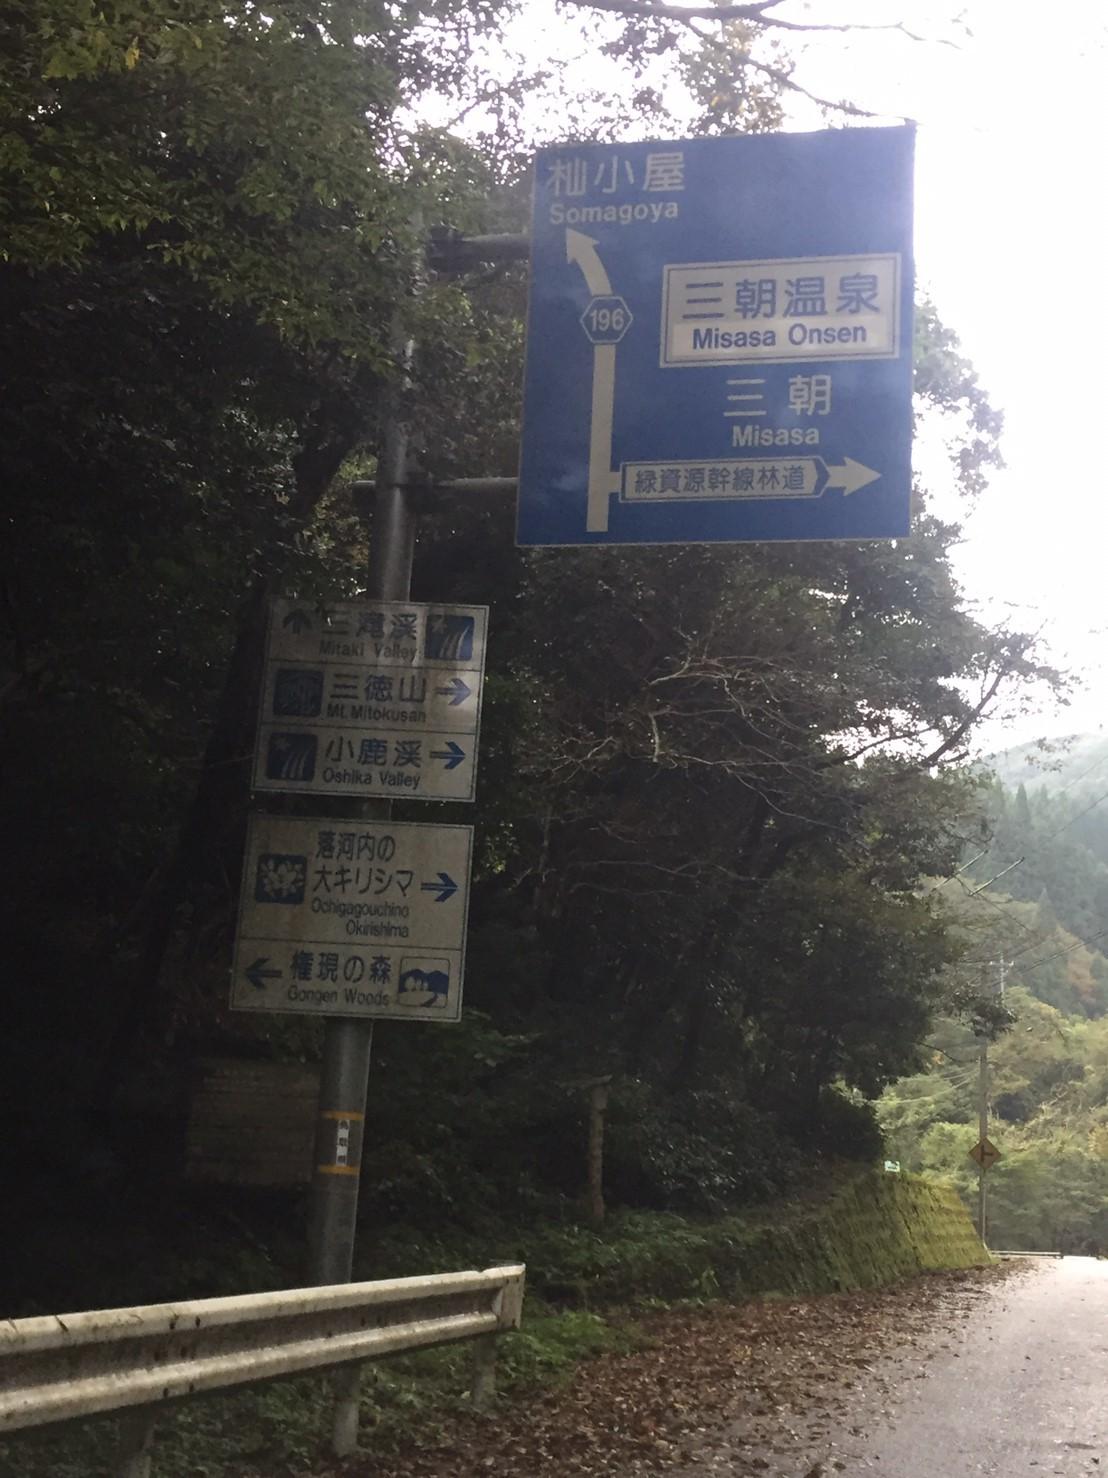 西郷工芸祭り・三滝渓_e0115904_16524453.jpg